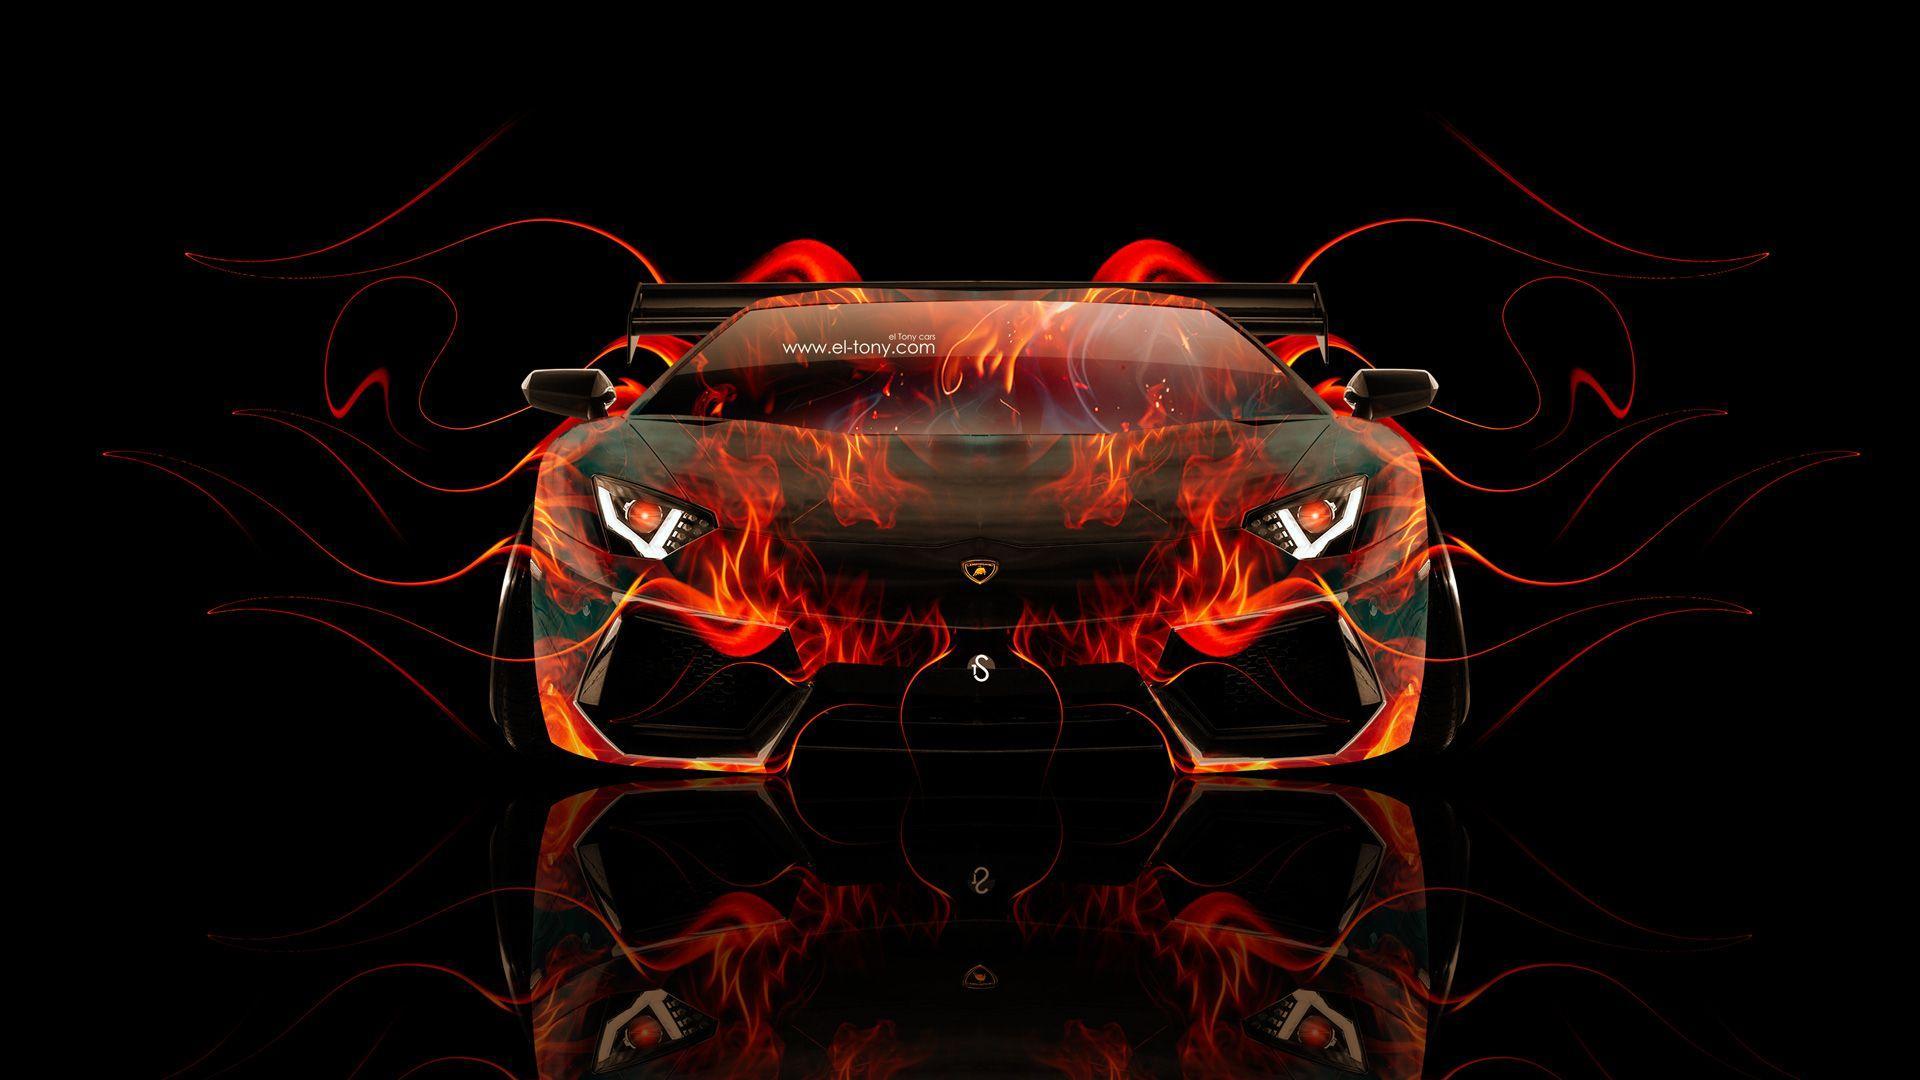 Lamborghini On Fire Wallpapers Top Free Lamborghini On Fire Backgrounds Wallpaperaccess